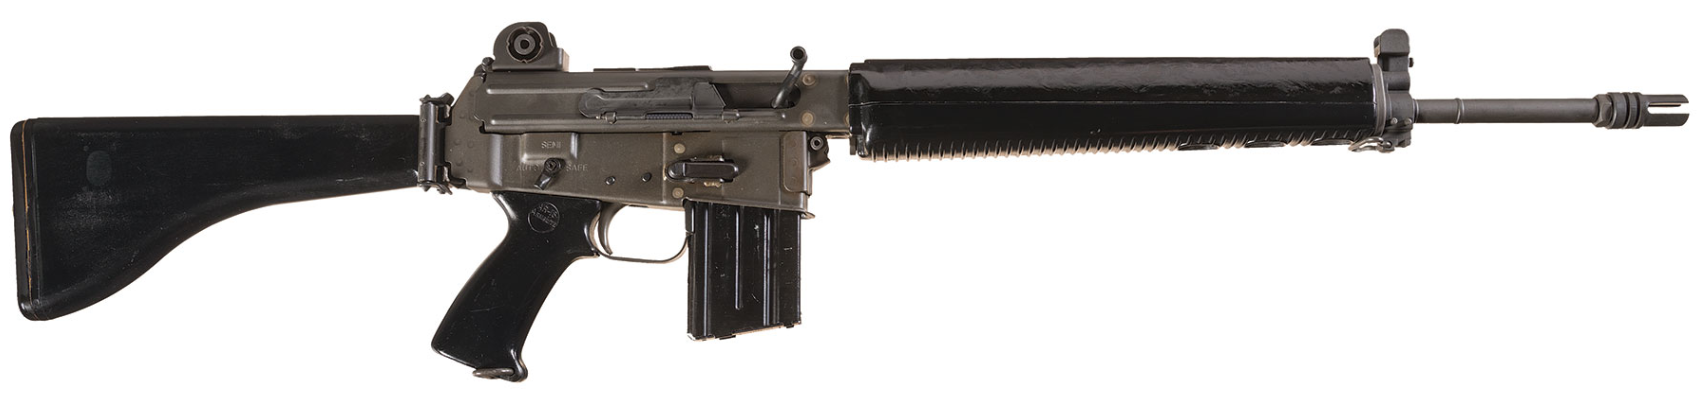 ArmaLiteAR-18.png